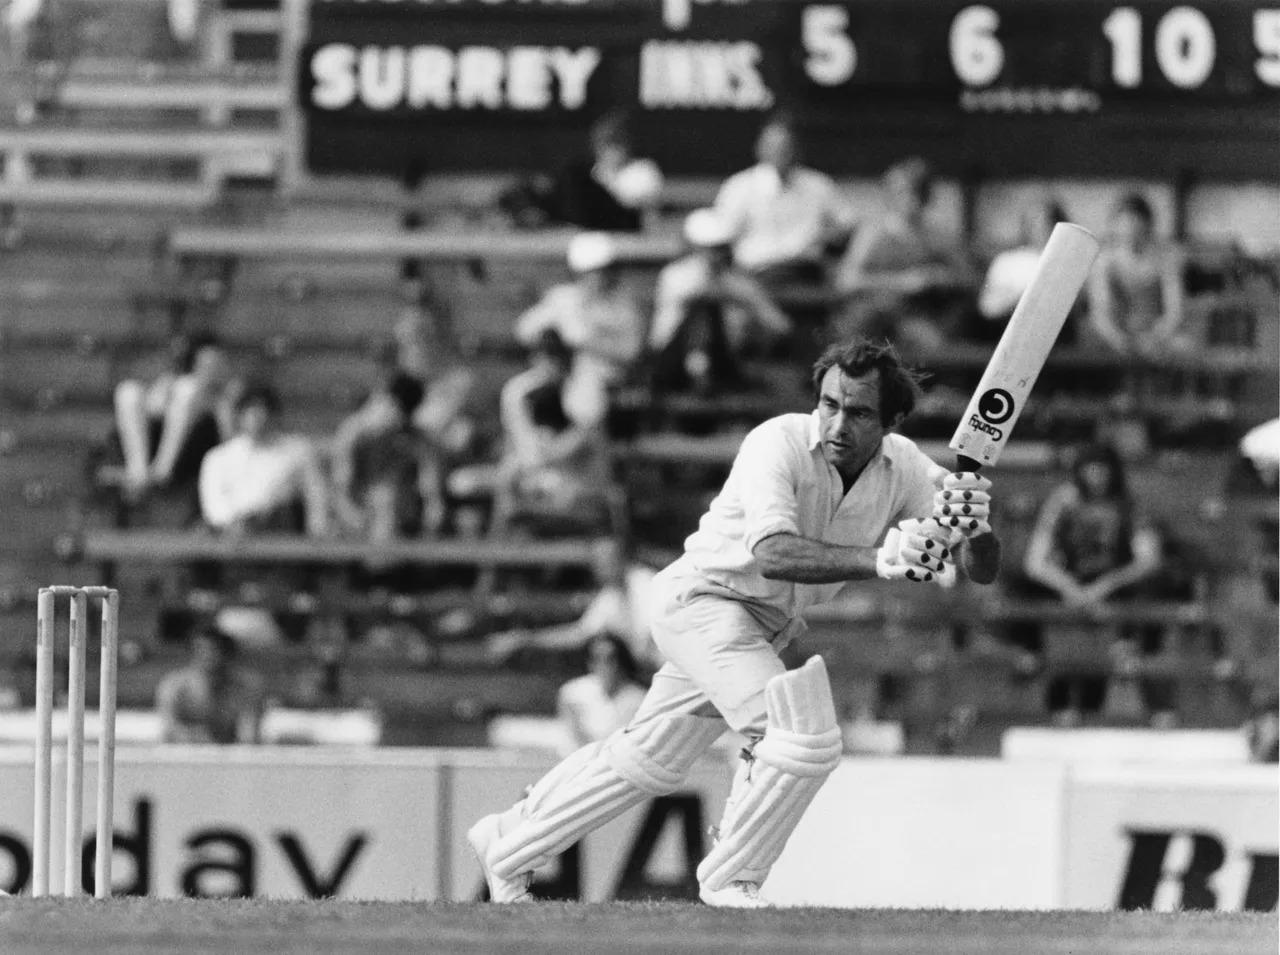 Former England Batsman John Edrich Passes Away at The Age of 83